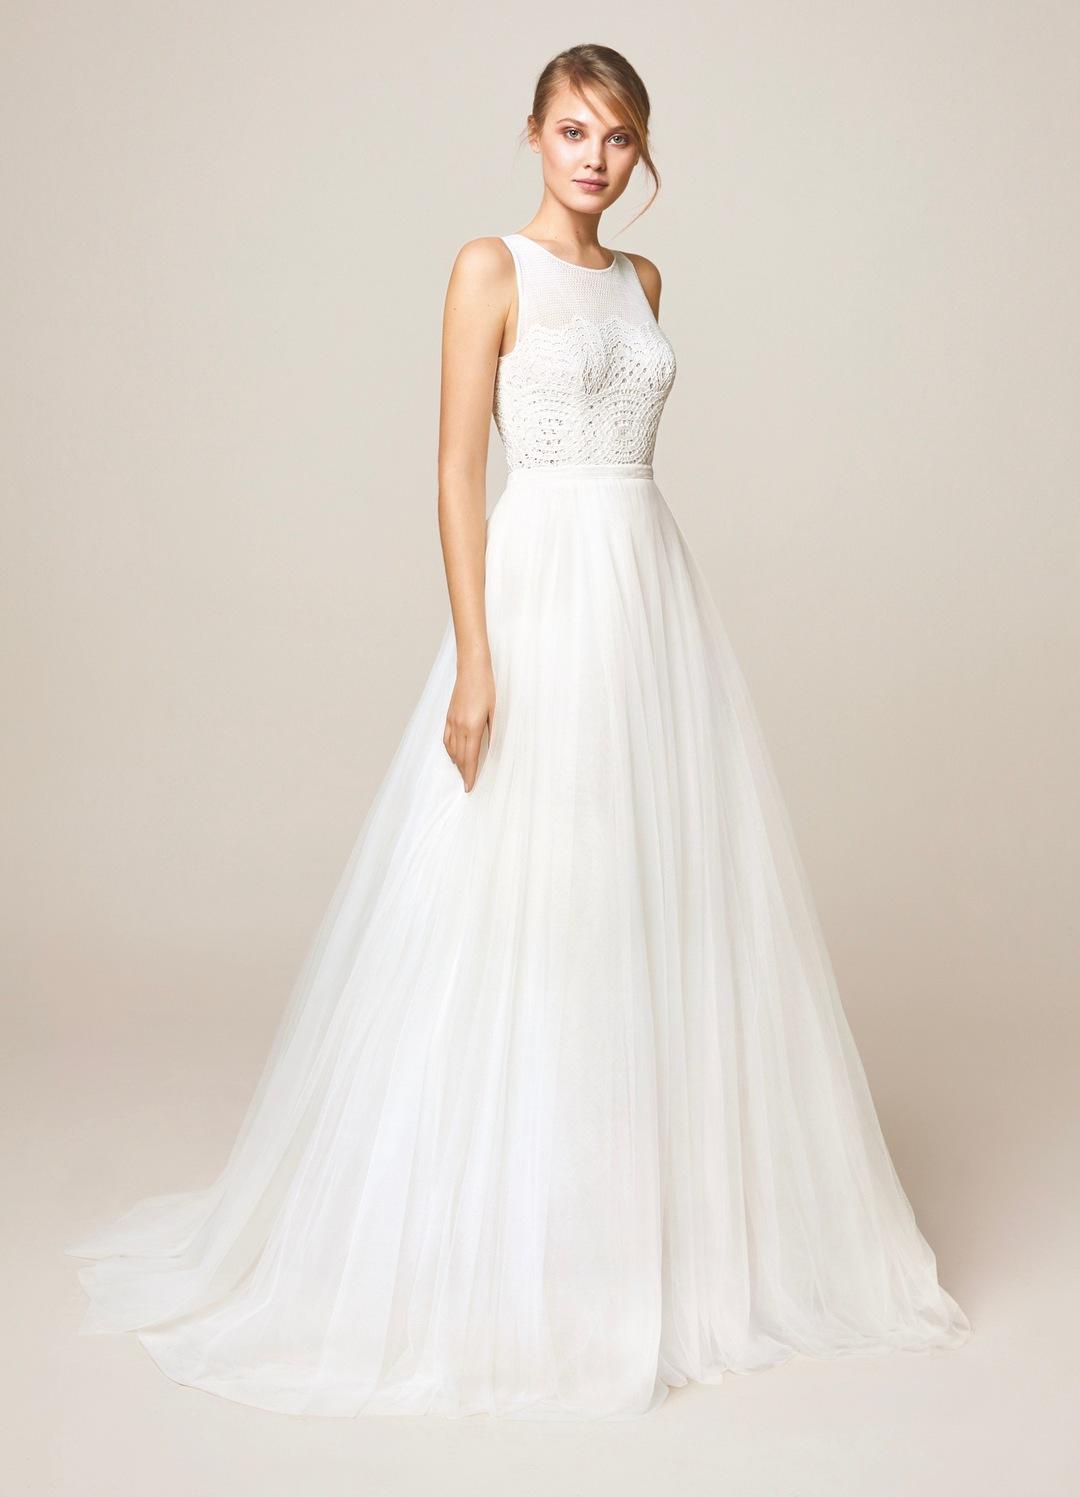 972 dress photo